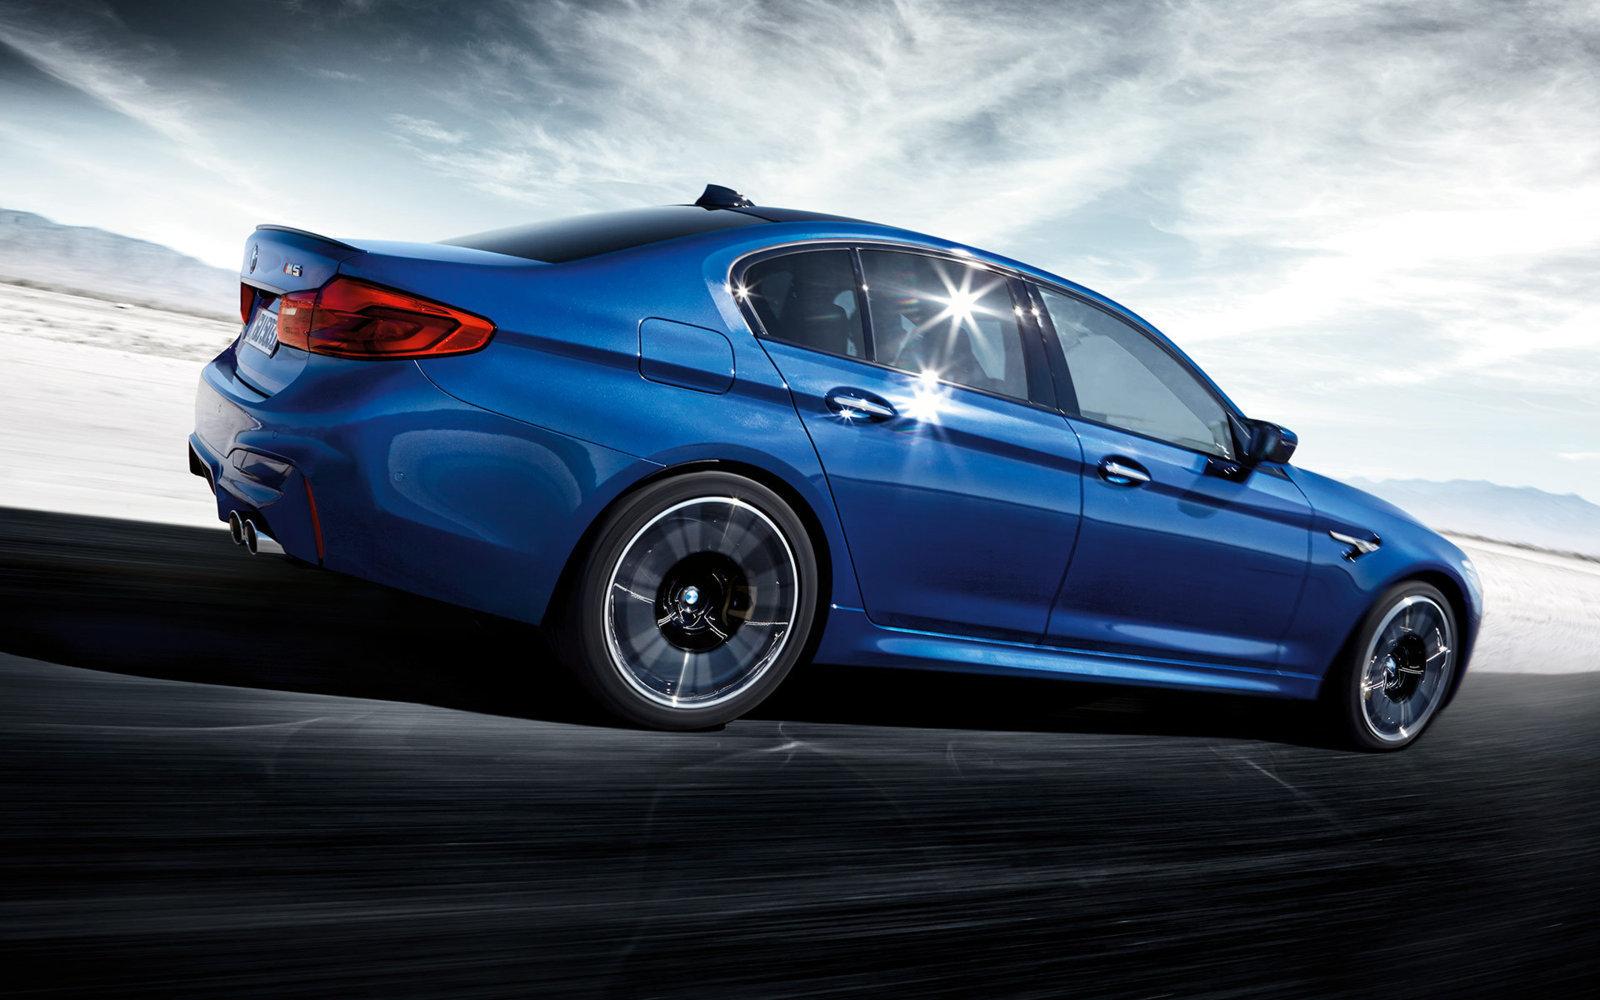 BMW-M5-2018-Wallpaper-4.jpg